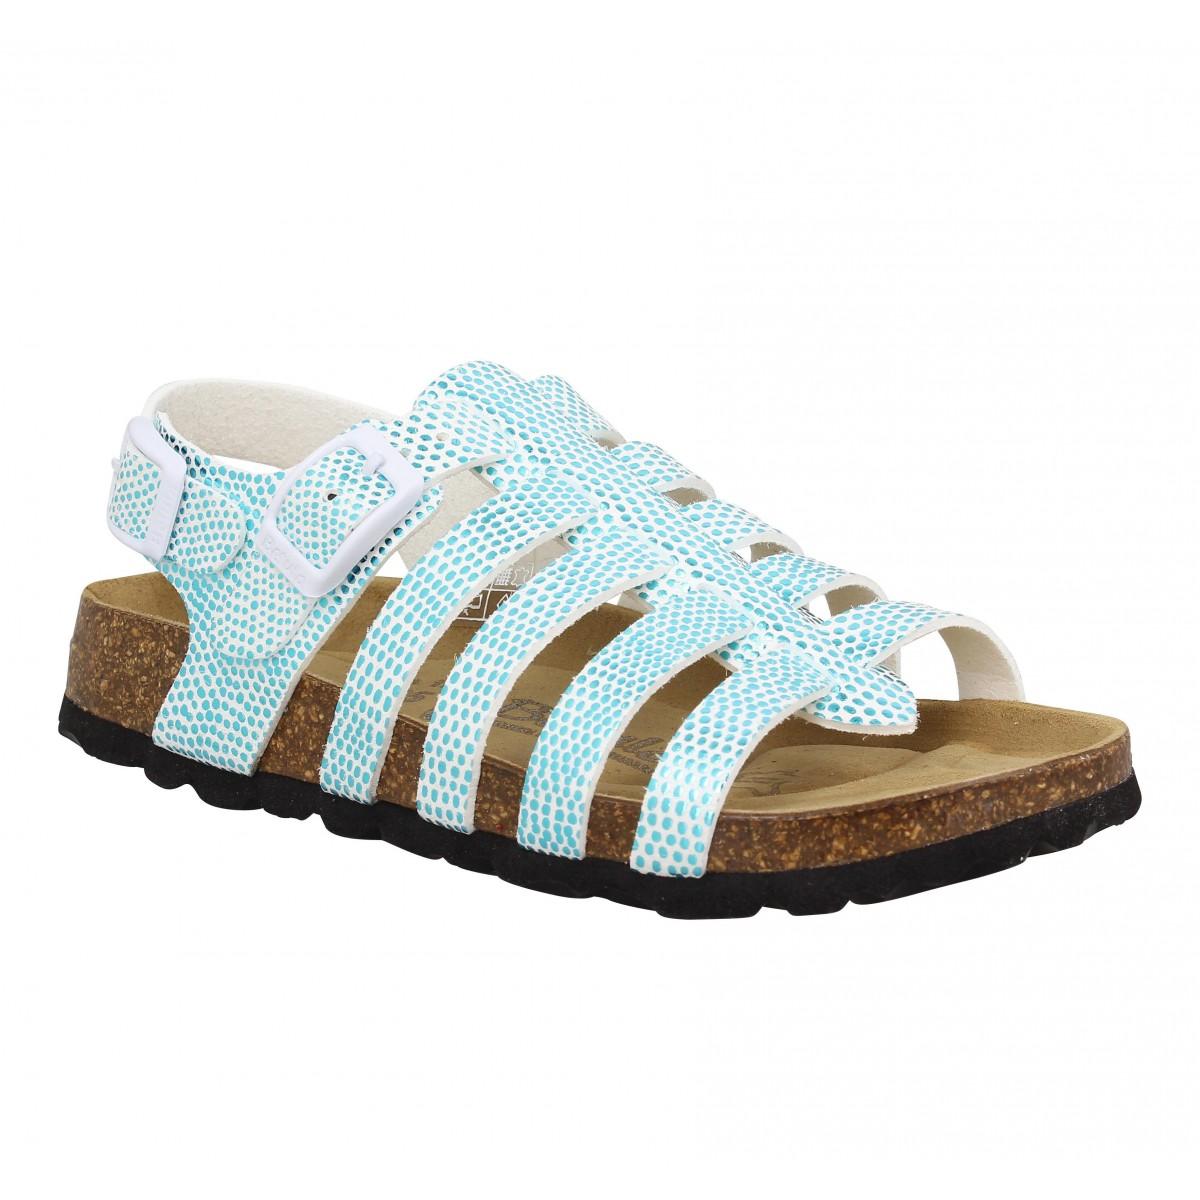 Sandales BETULA Leona Birko Flor Enfant Turquoise